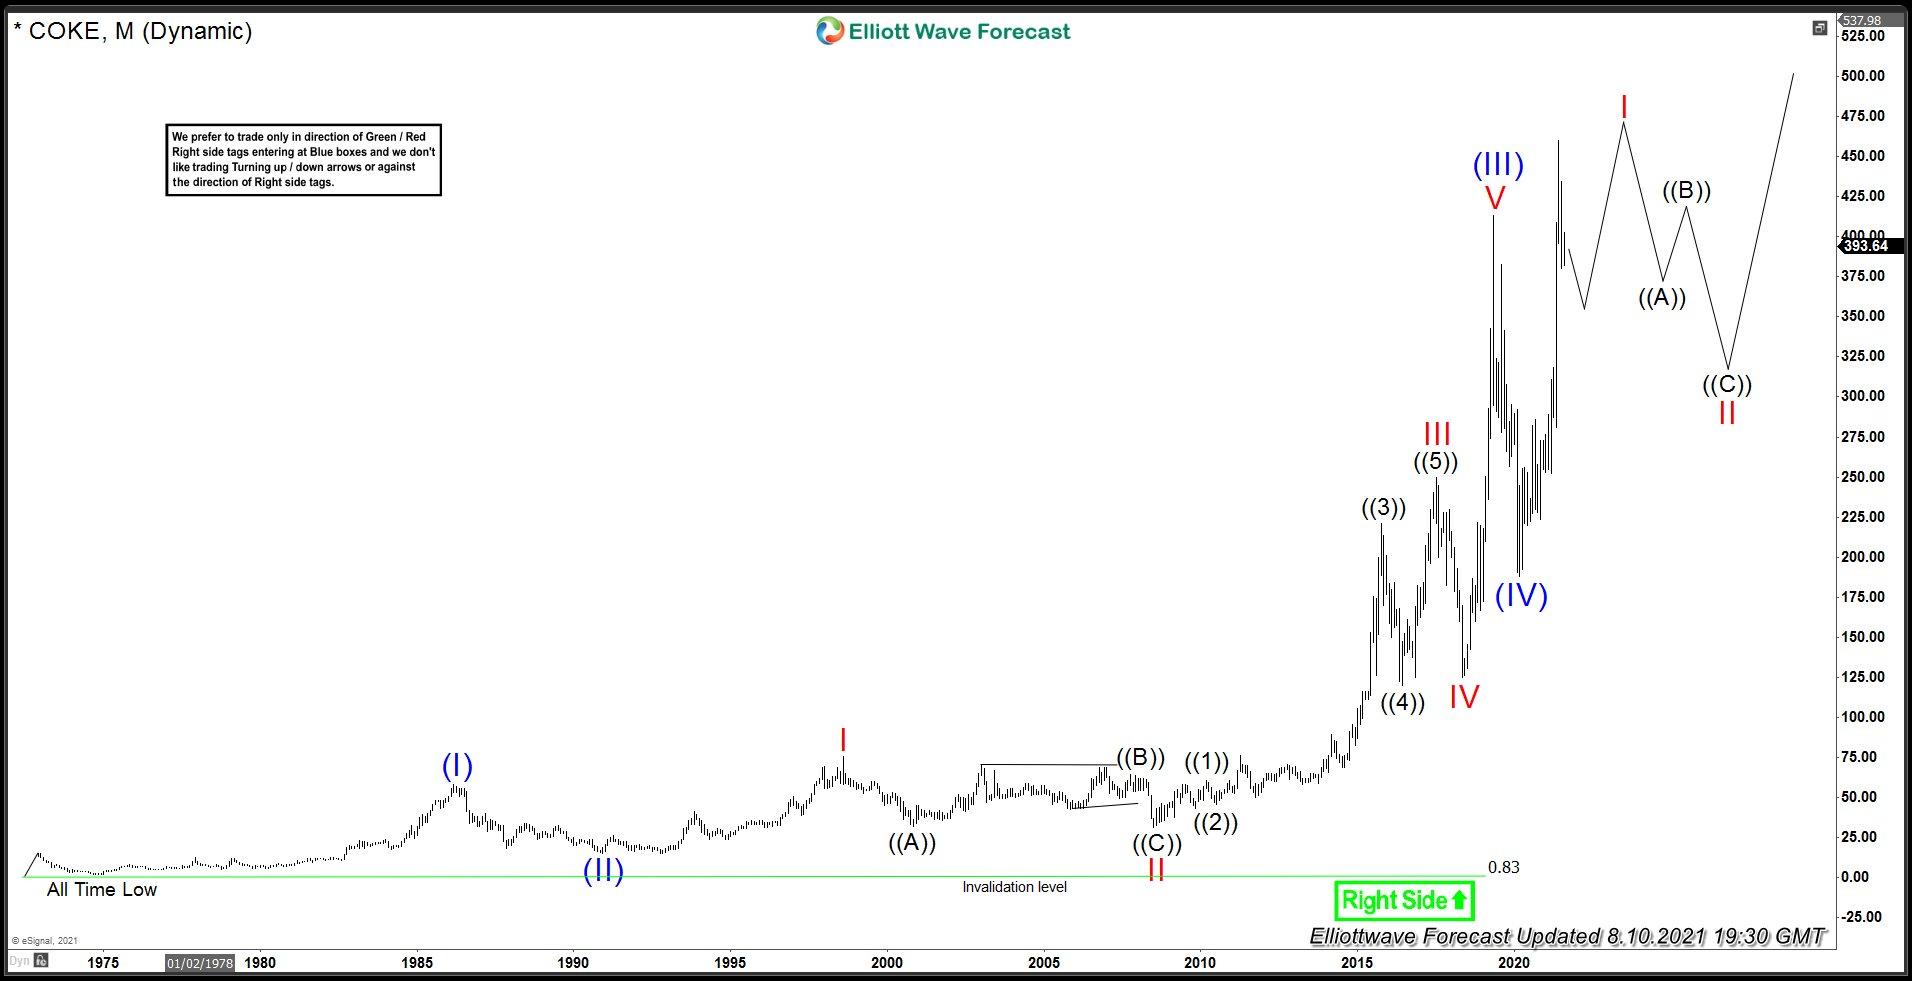 COKE Monthly Elliott Wave Analysis